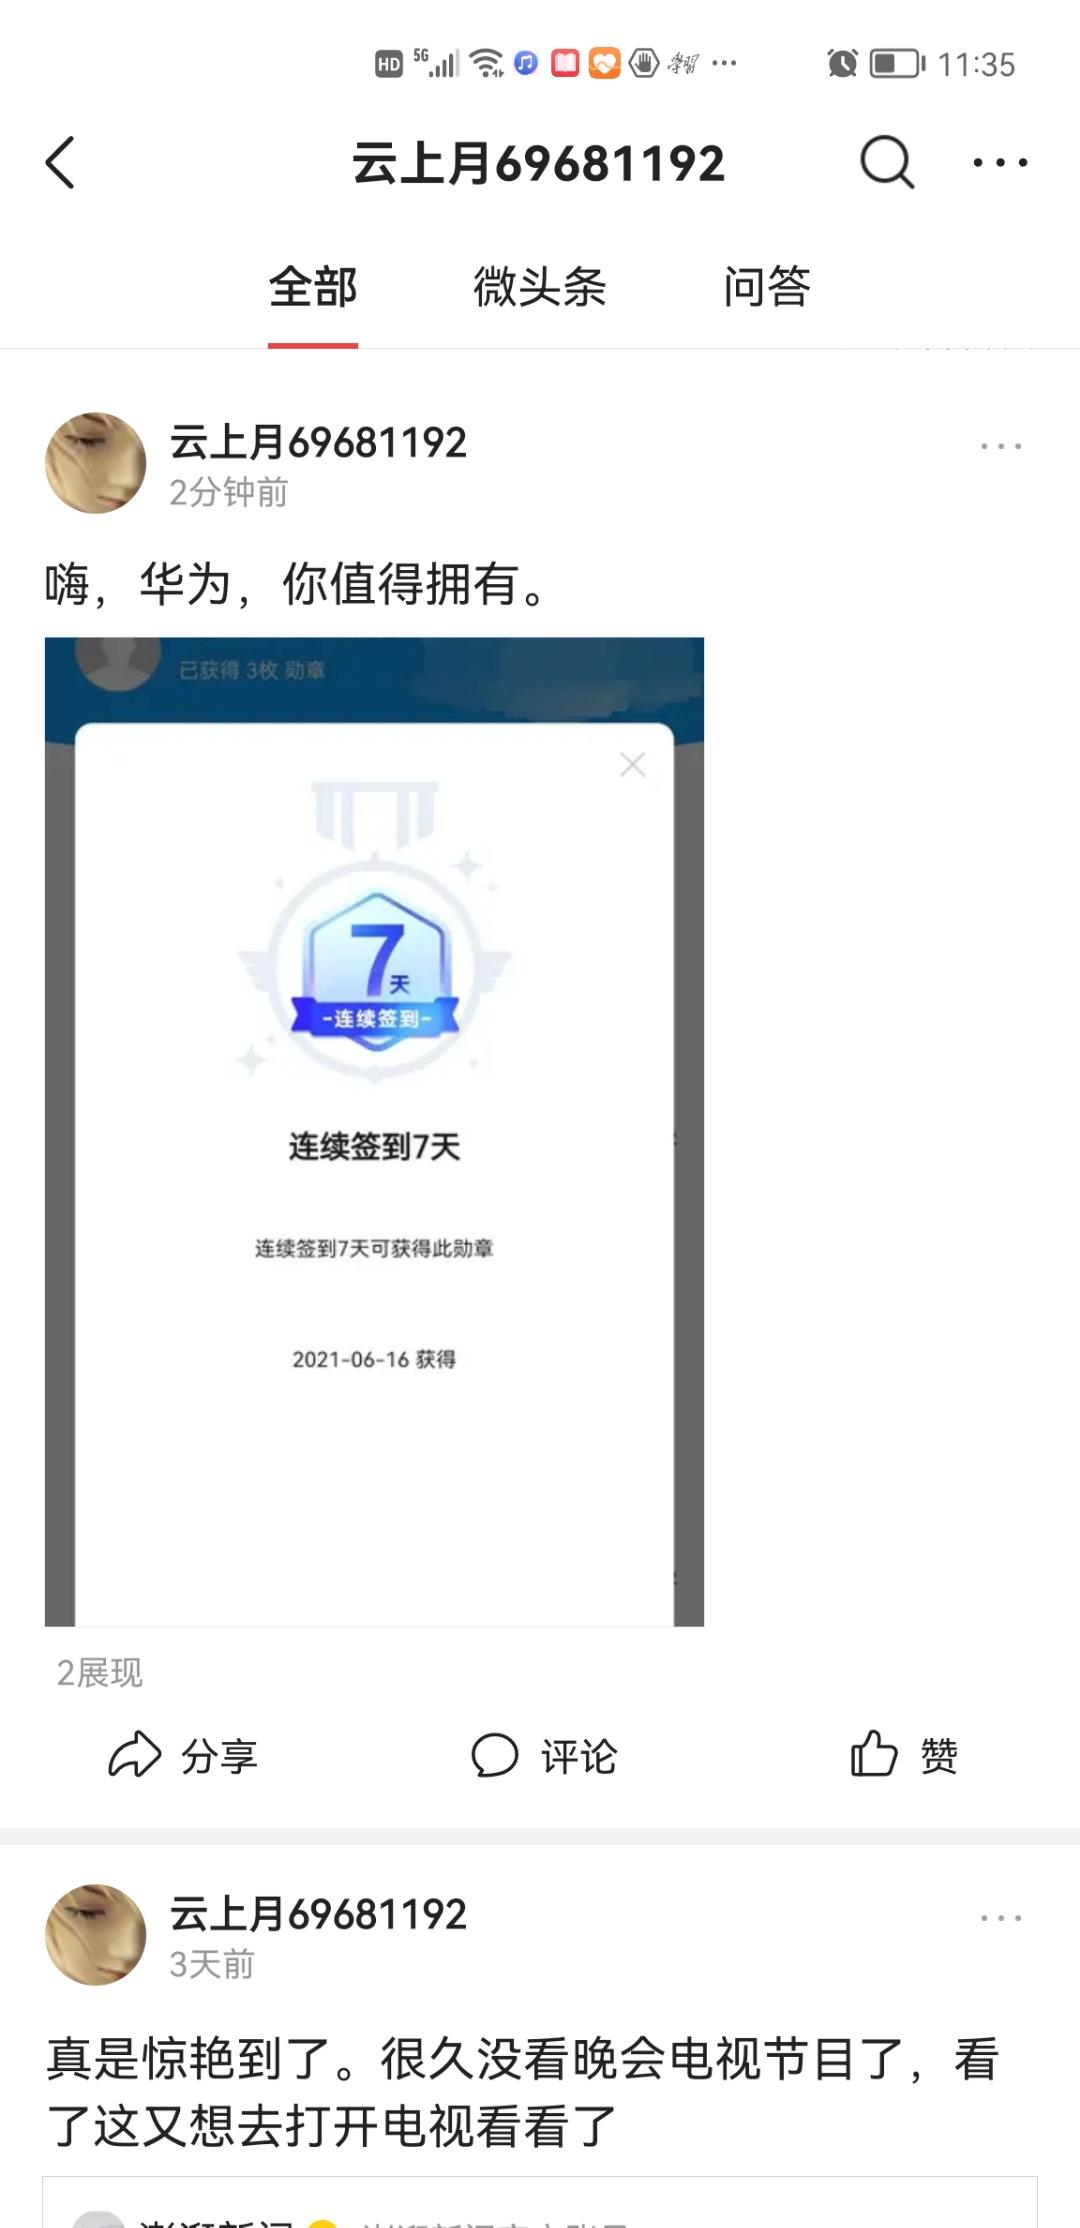 Screenshot_20210616_233547_com.ss.android.article.news.jpg